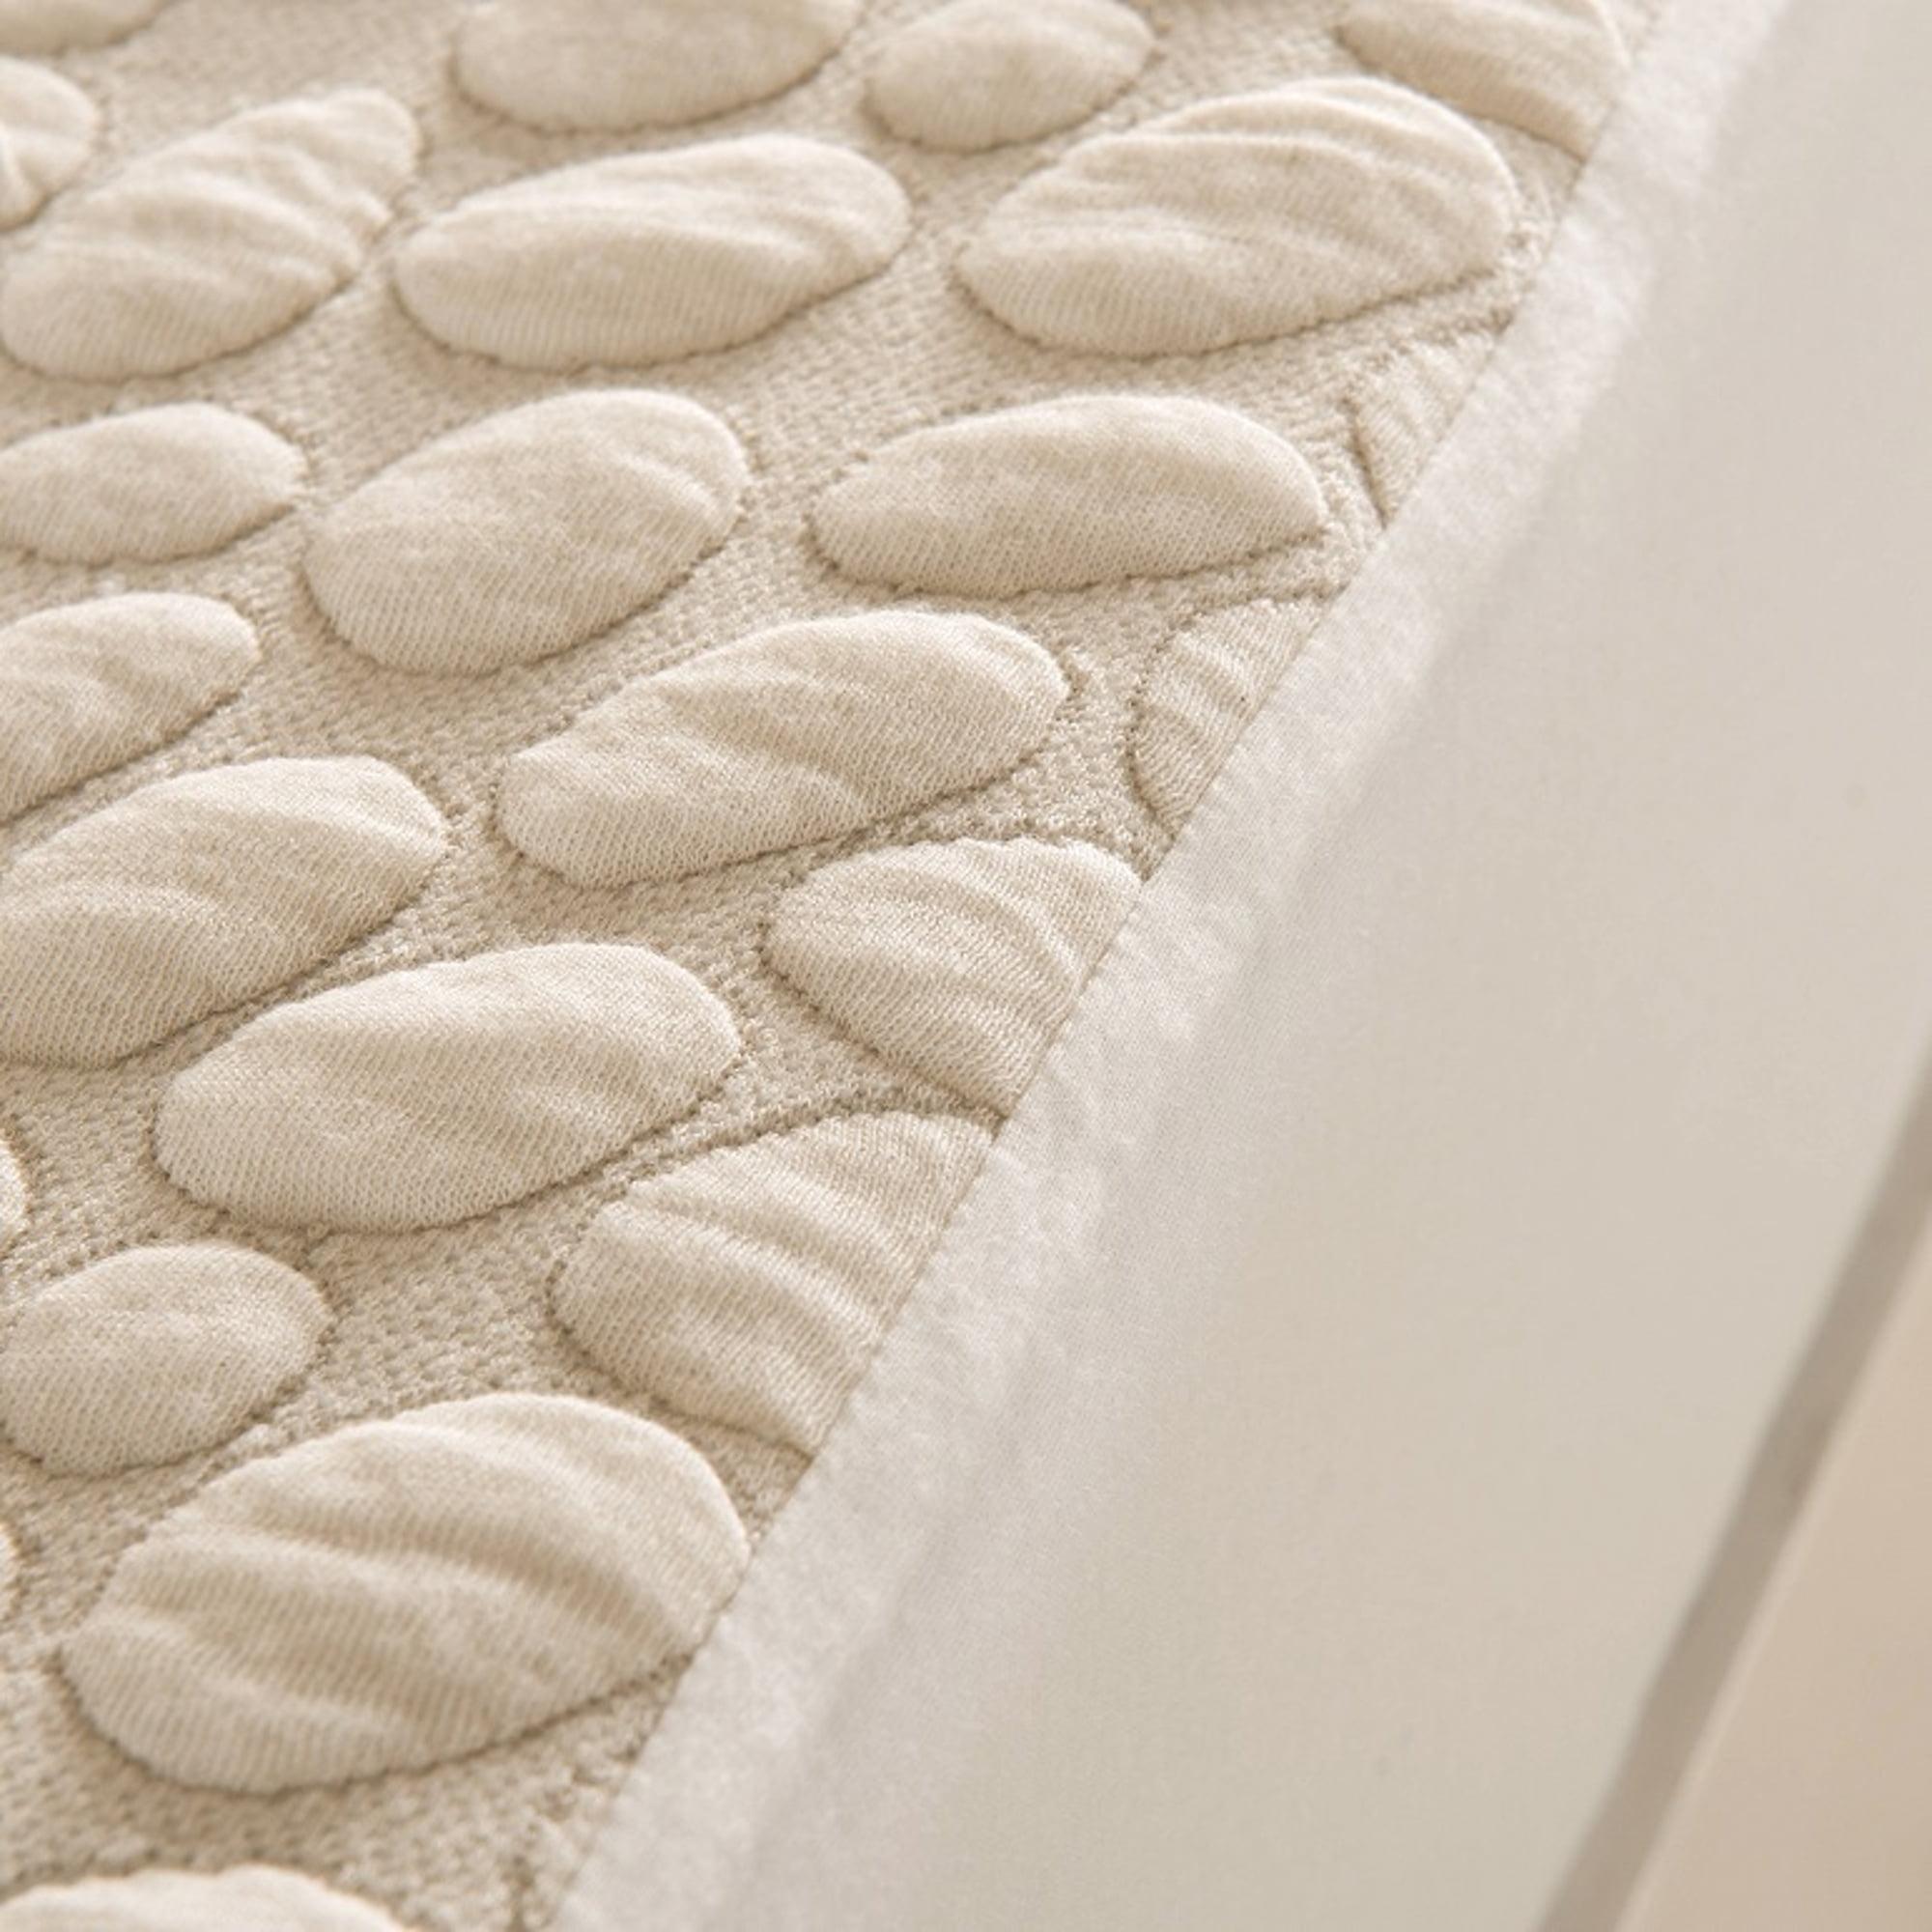 Dream Signature Collection Pebbletex Organic Cotton Mattress Protector